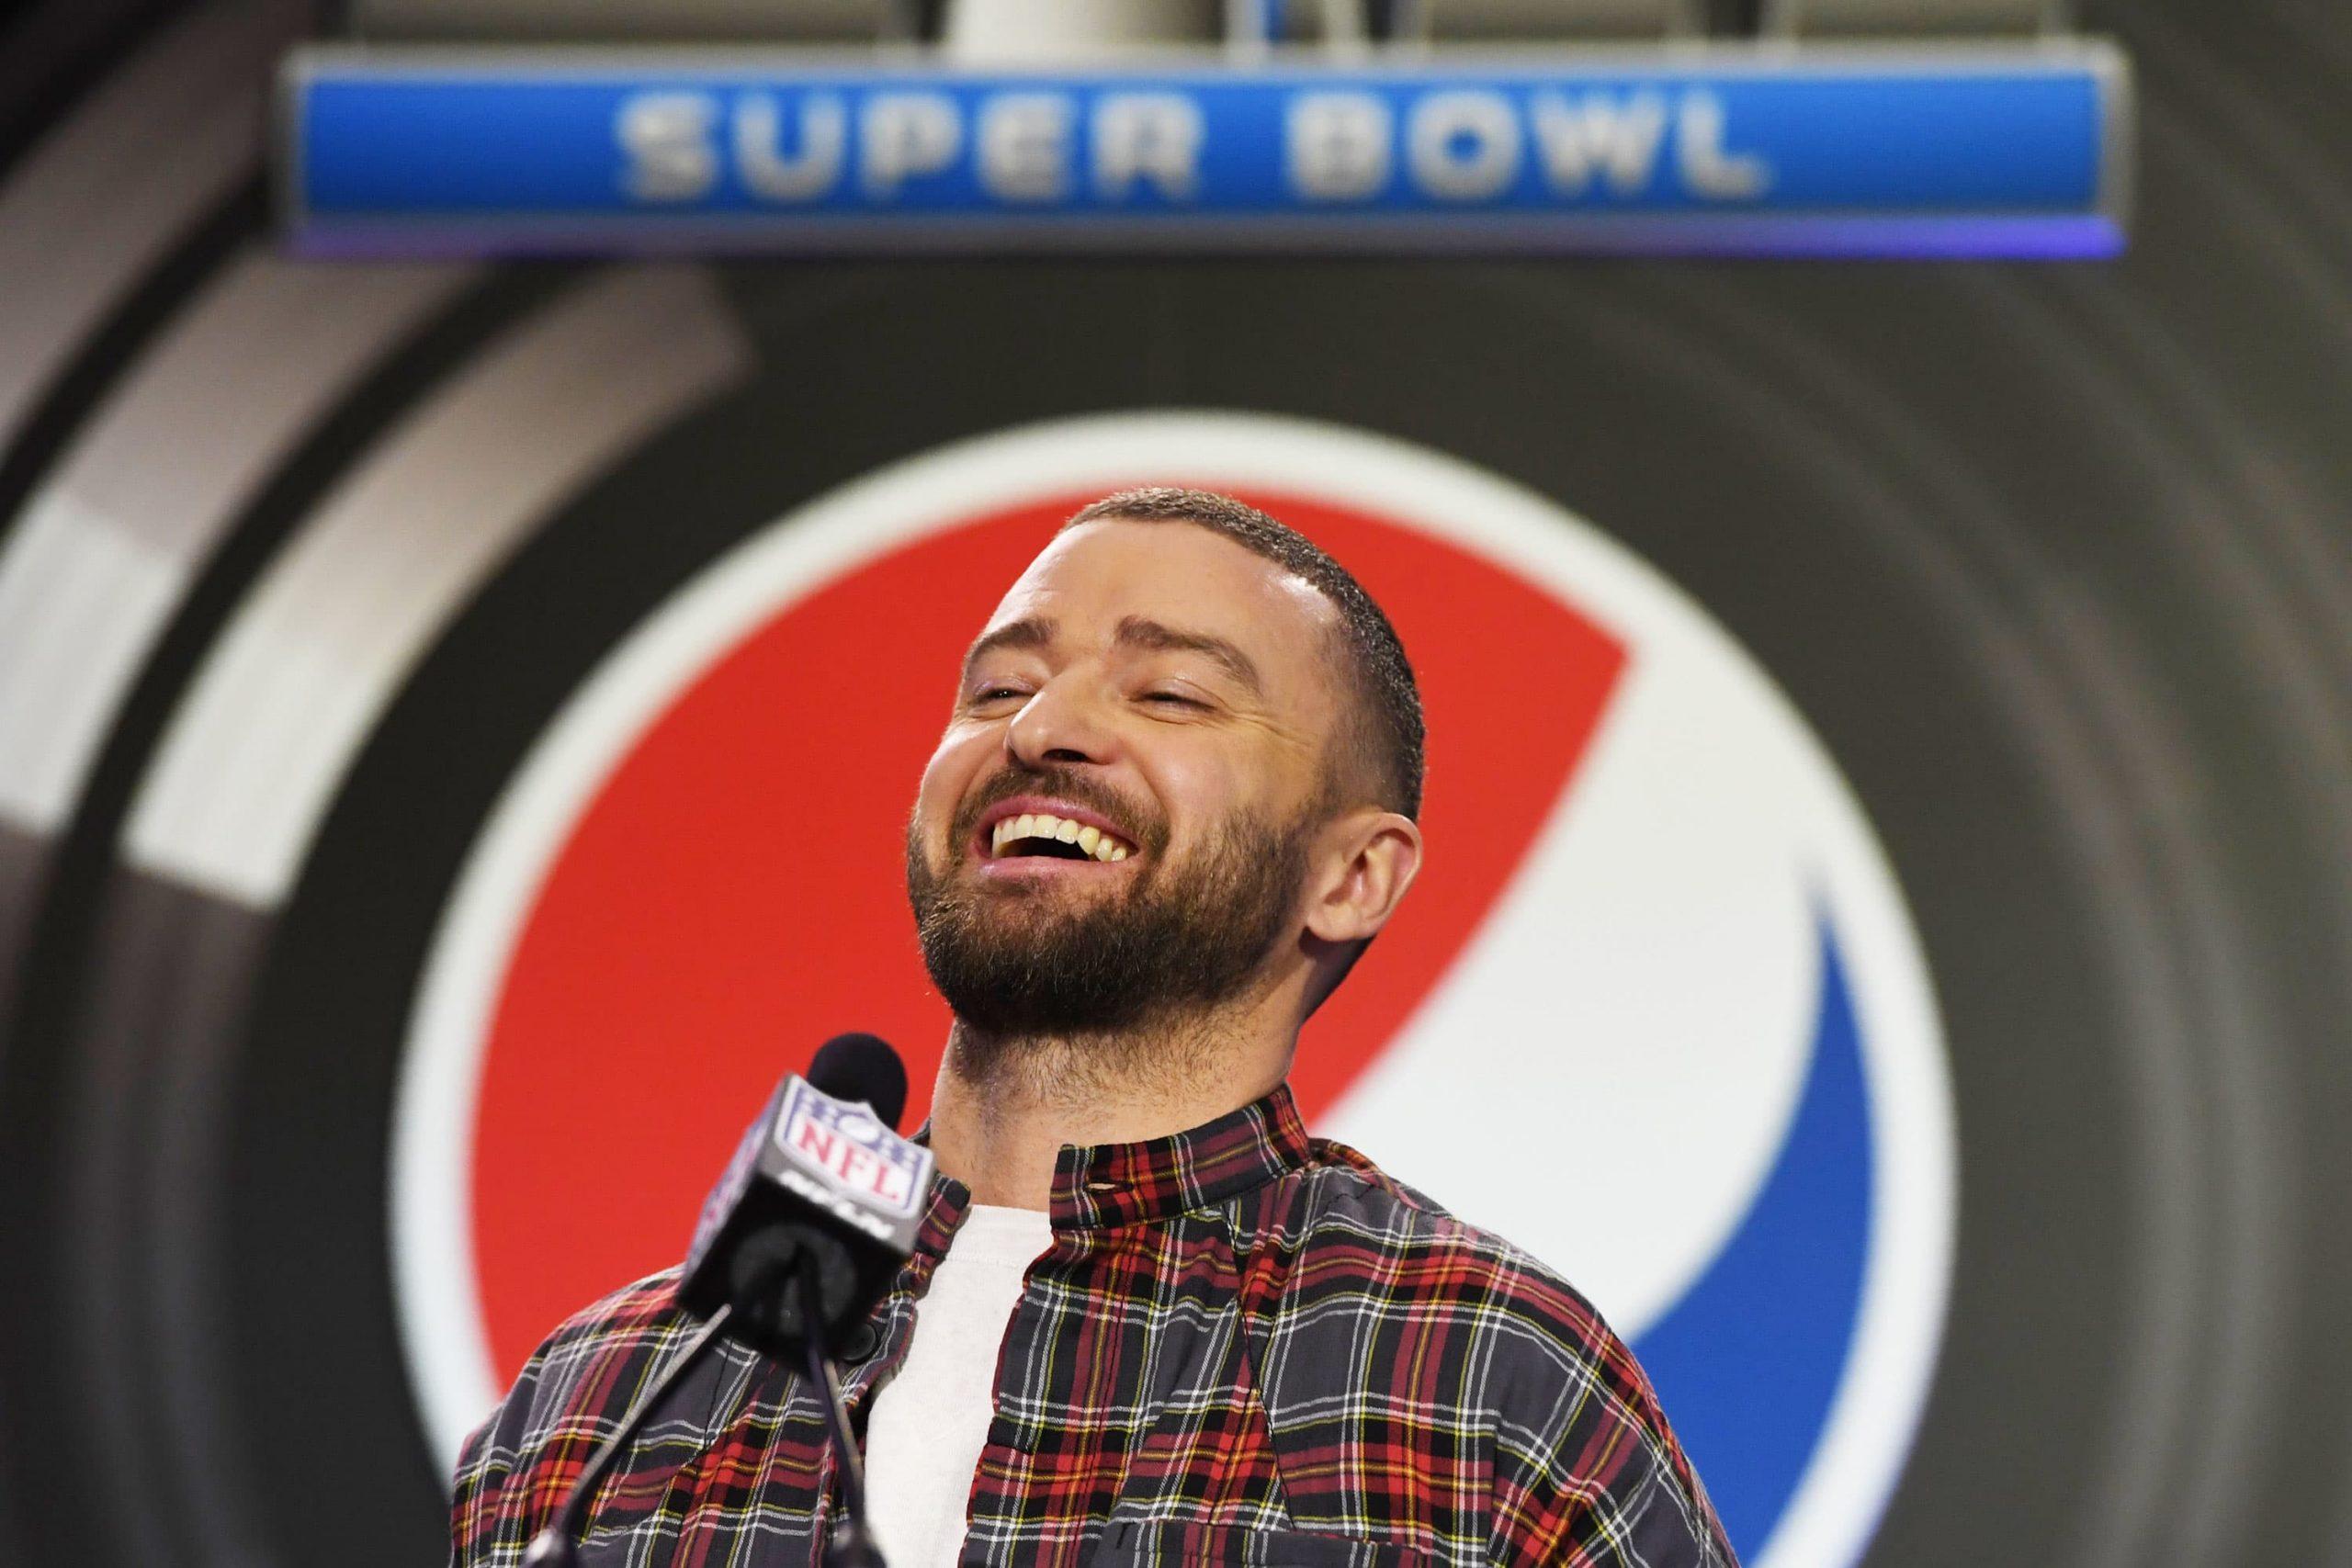 Coca-cola And Pepsi Won't Be Advertising Their Namesake Sodas During The Super Bowl photo